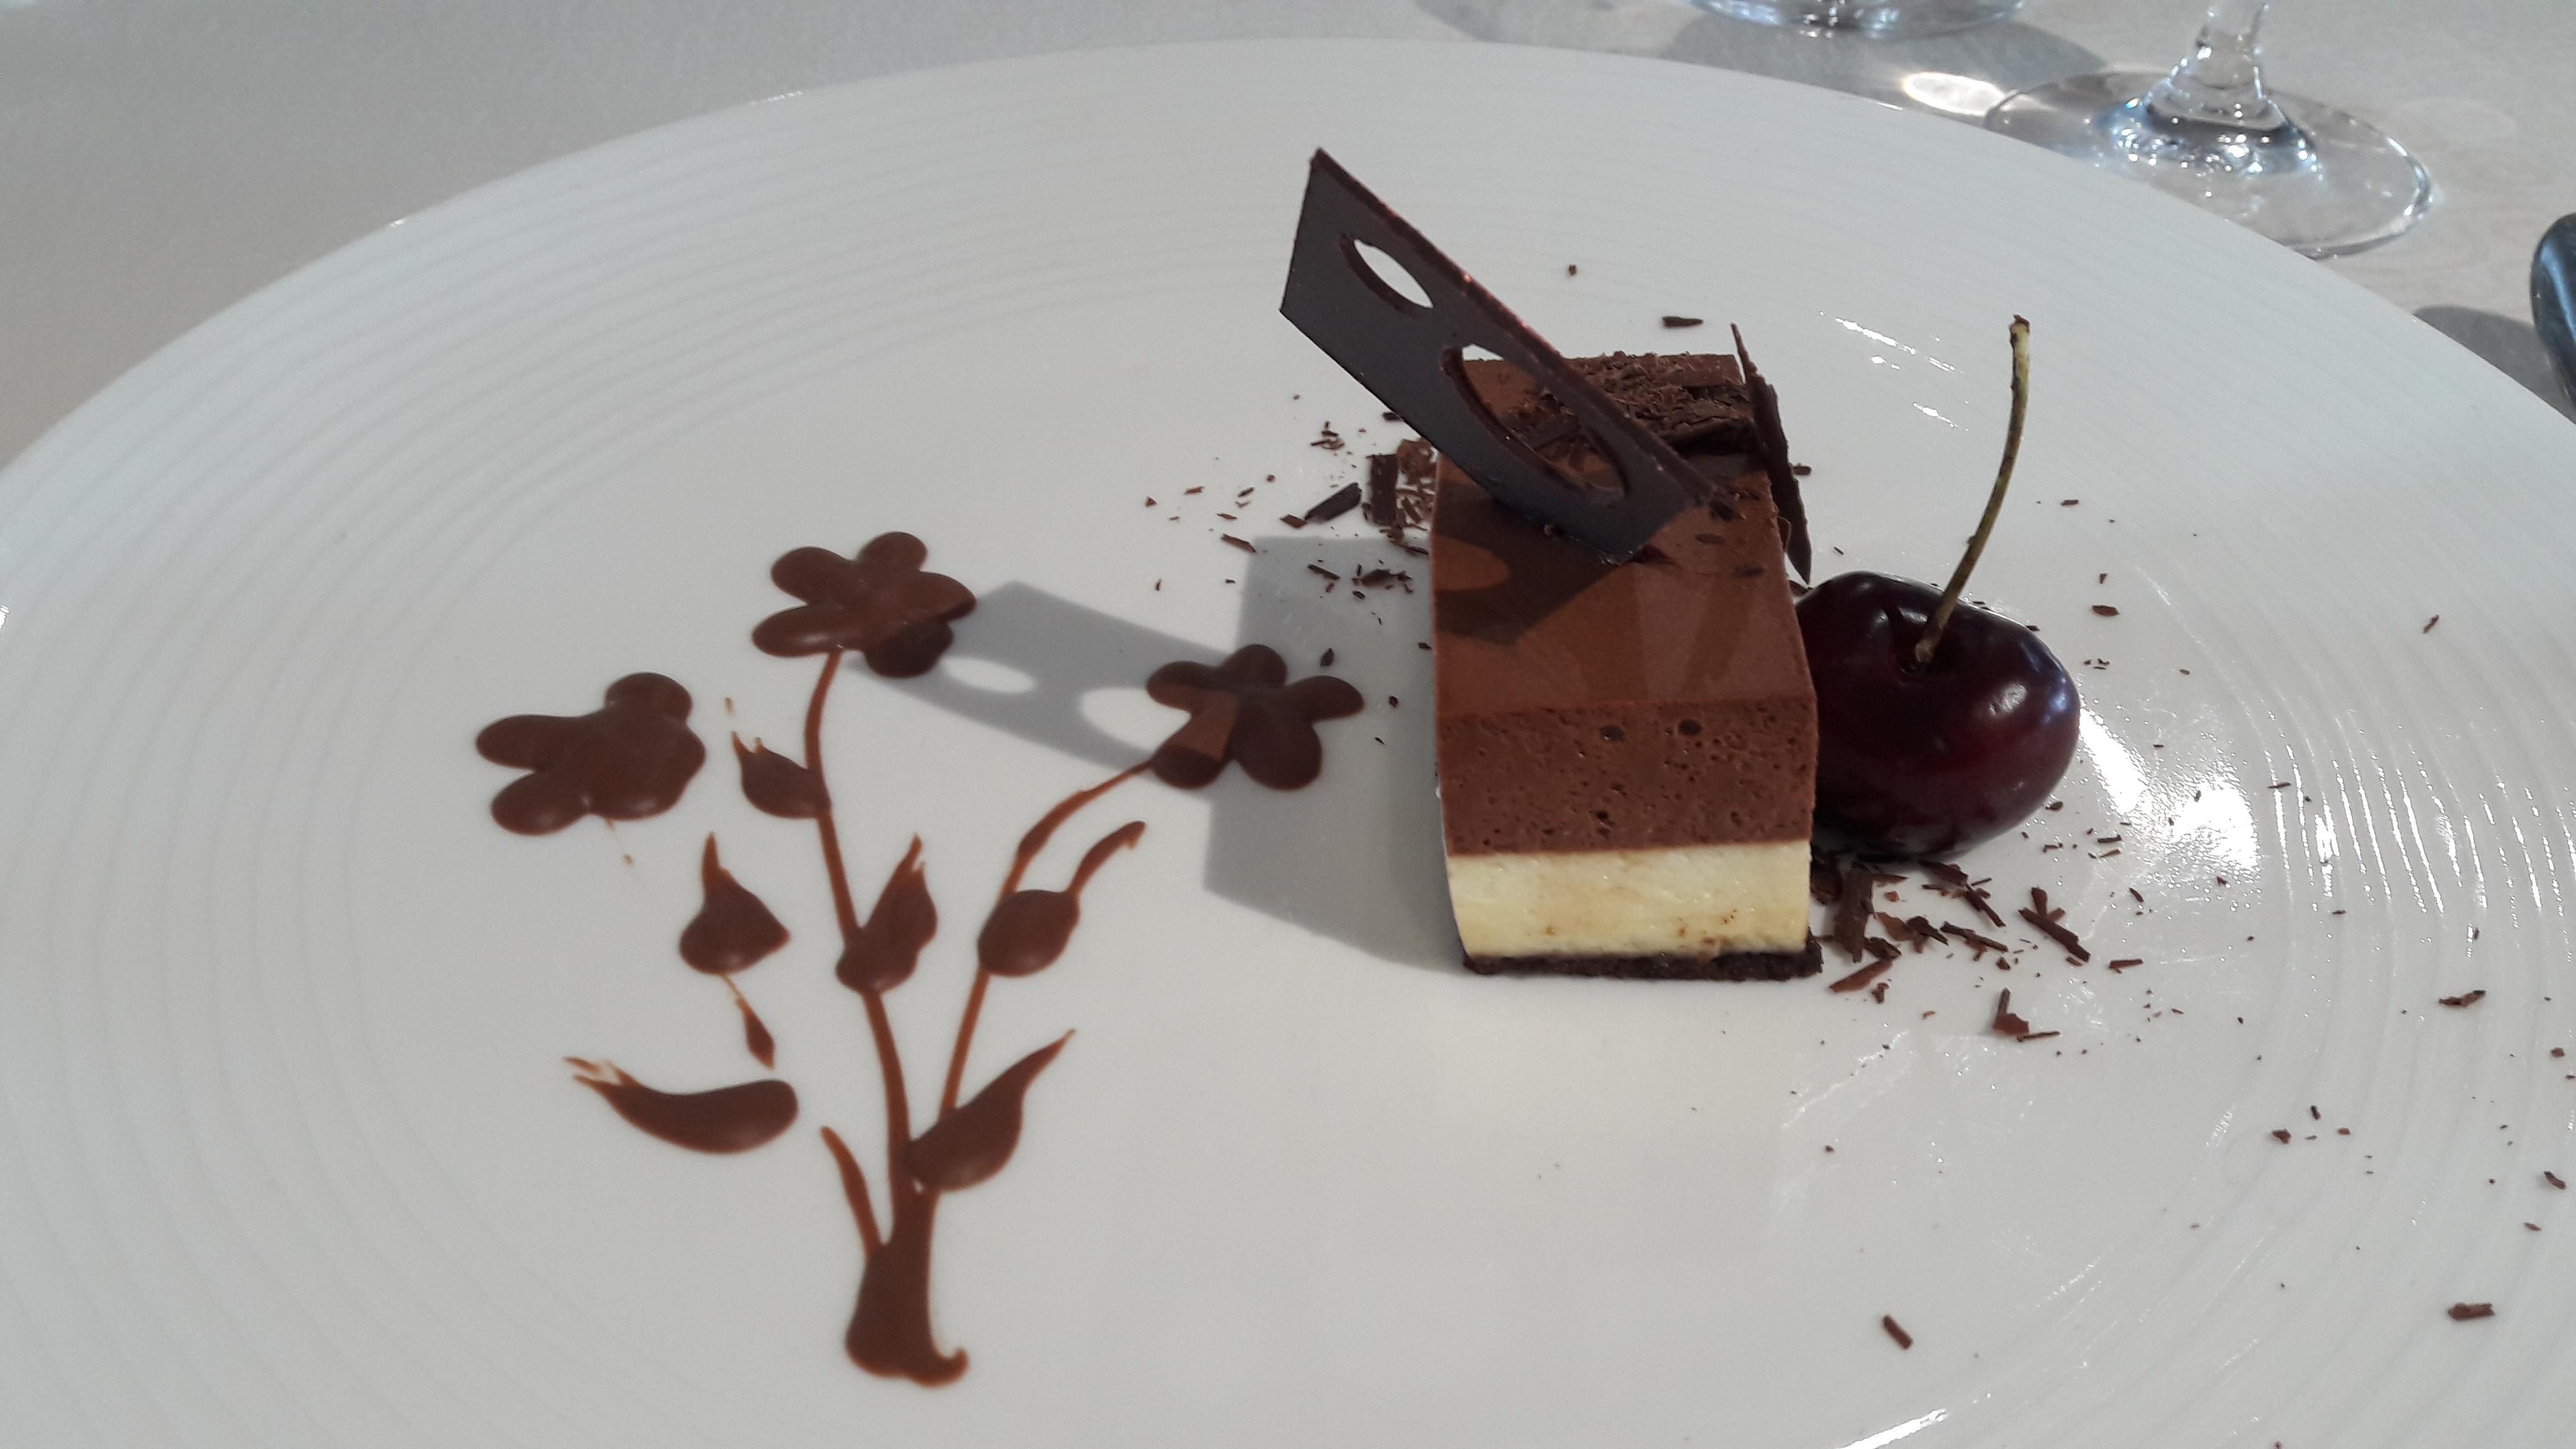 Dessert aboard the Silver Explorer